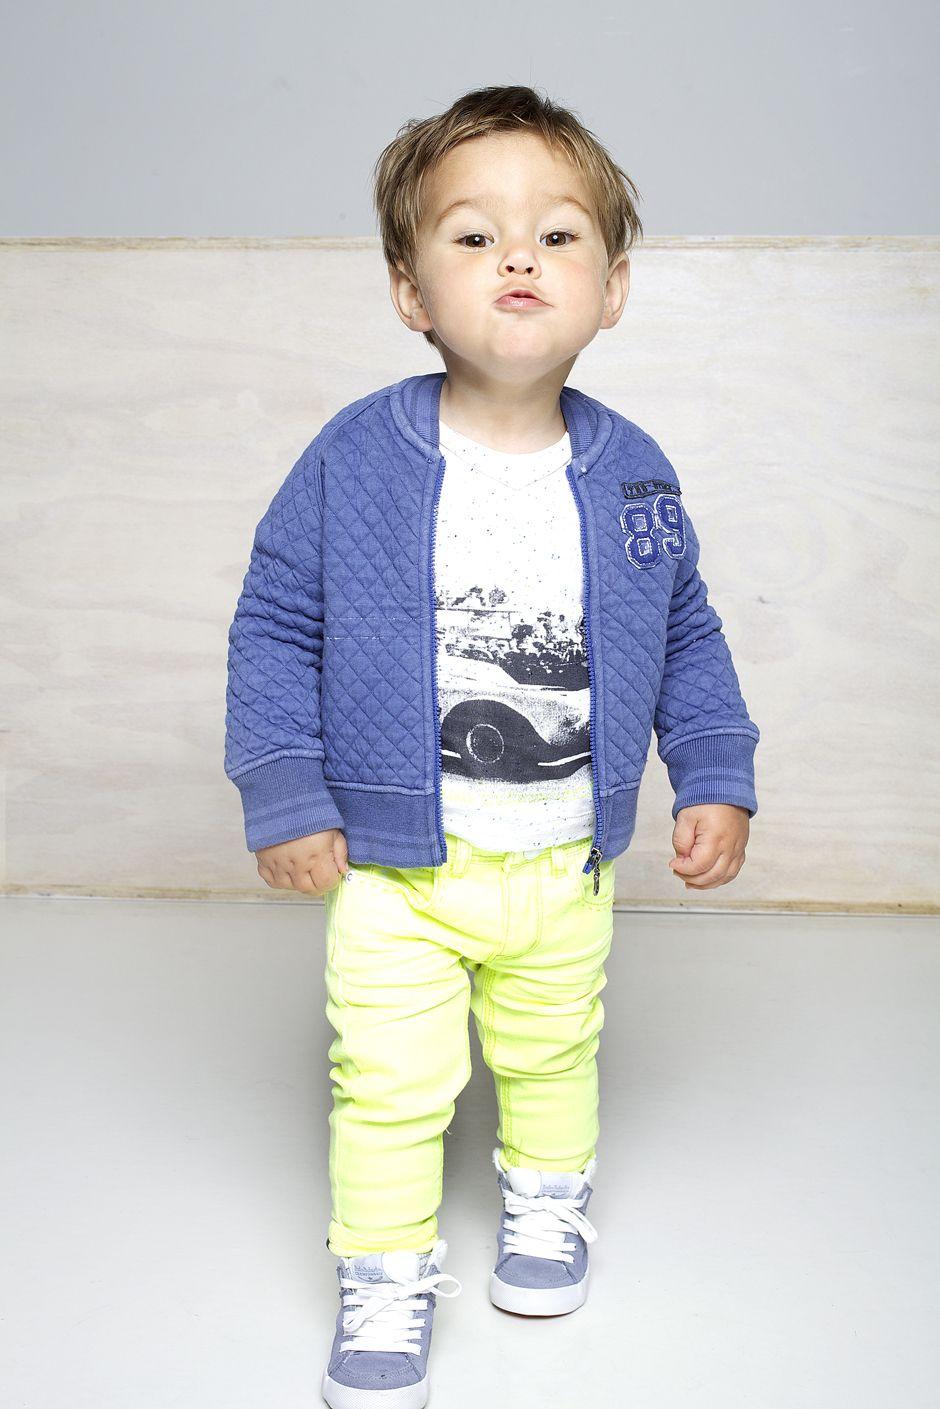 46b809cd5dfd0e Niagara boys lo denim Tumble 'N Dry | Summerwear - little boy's ...